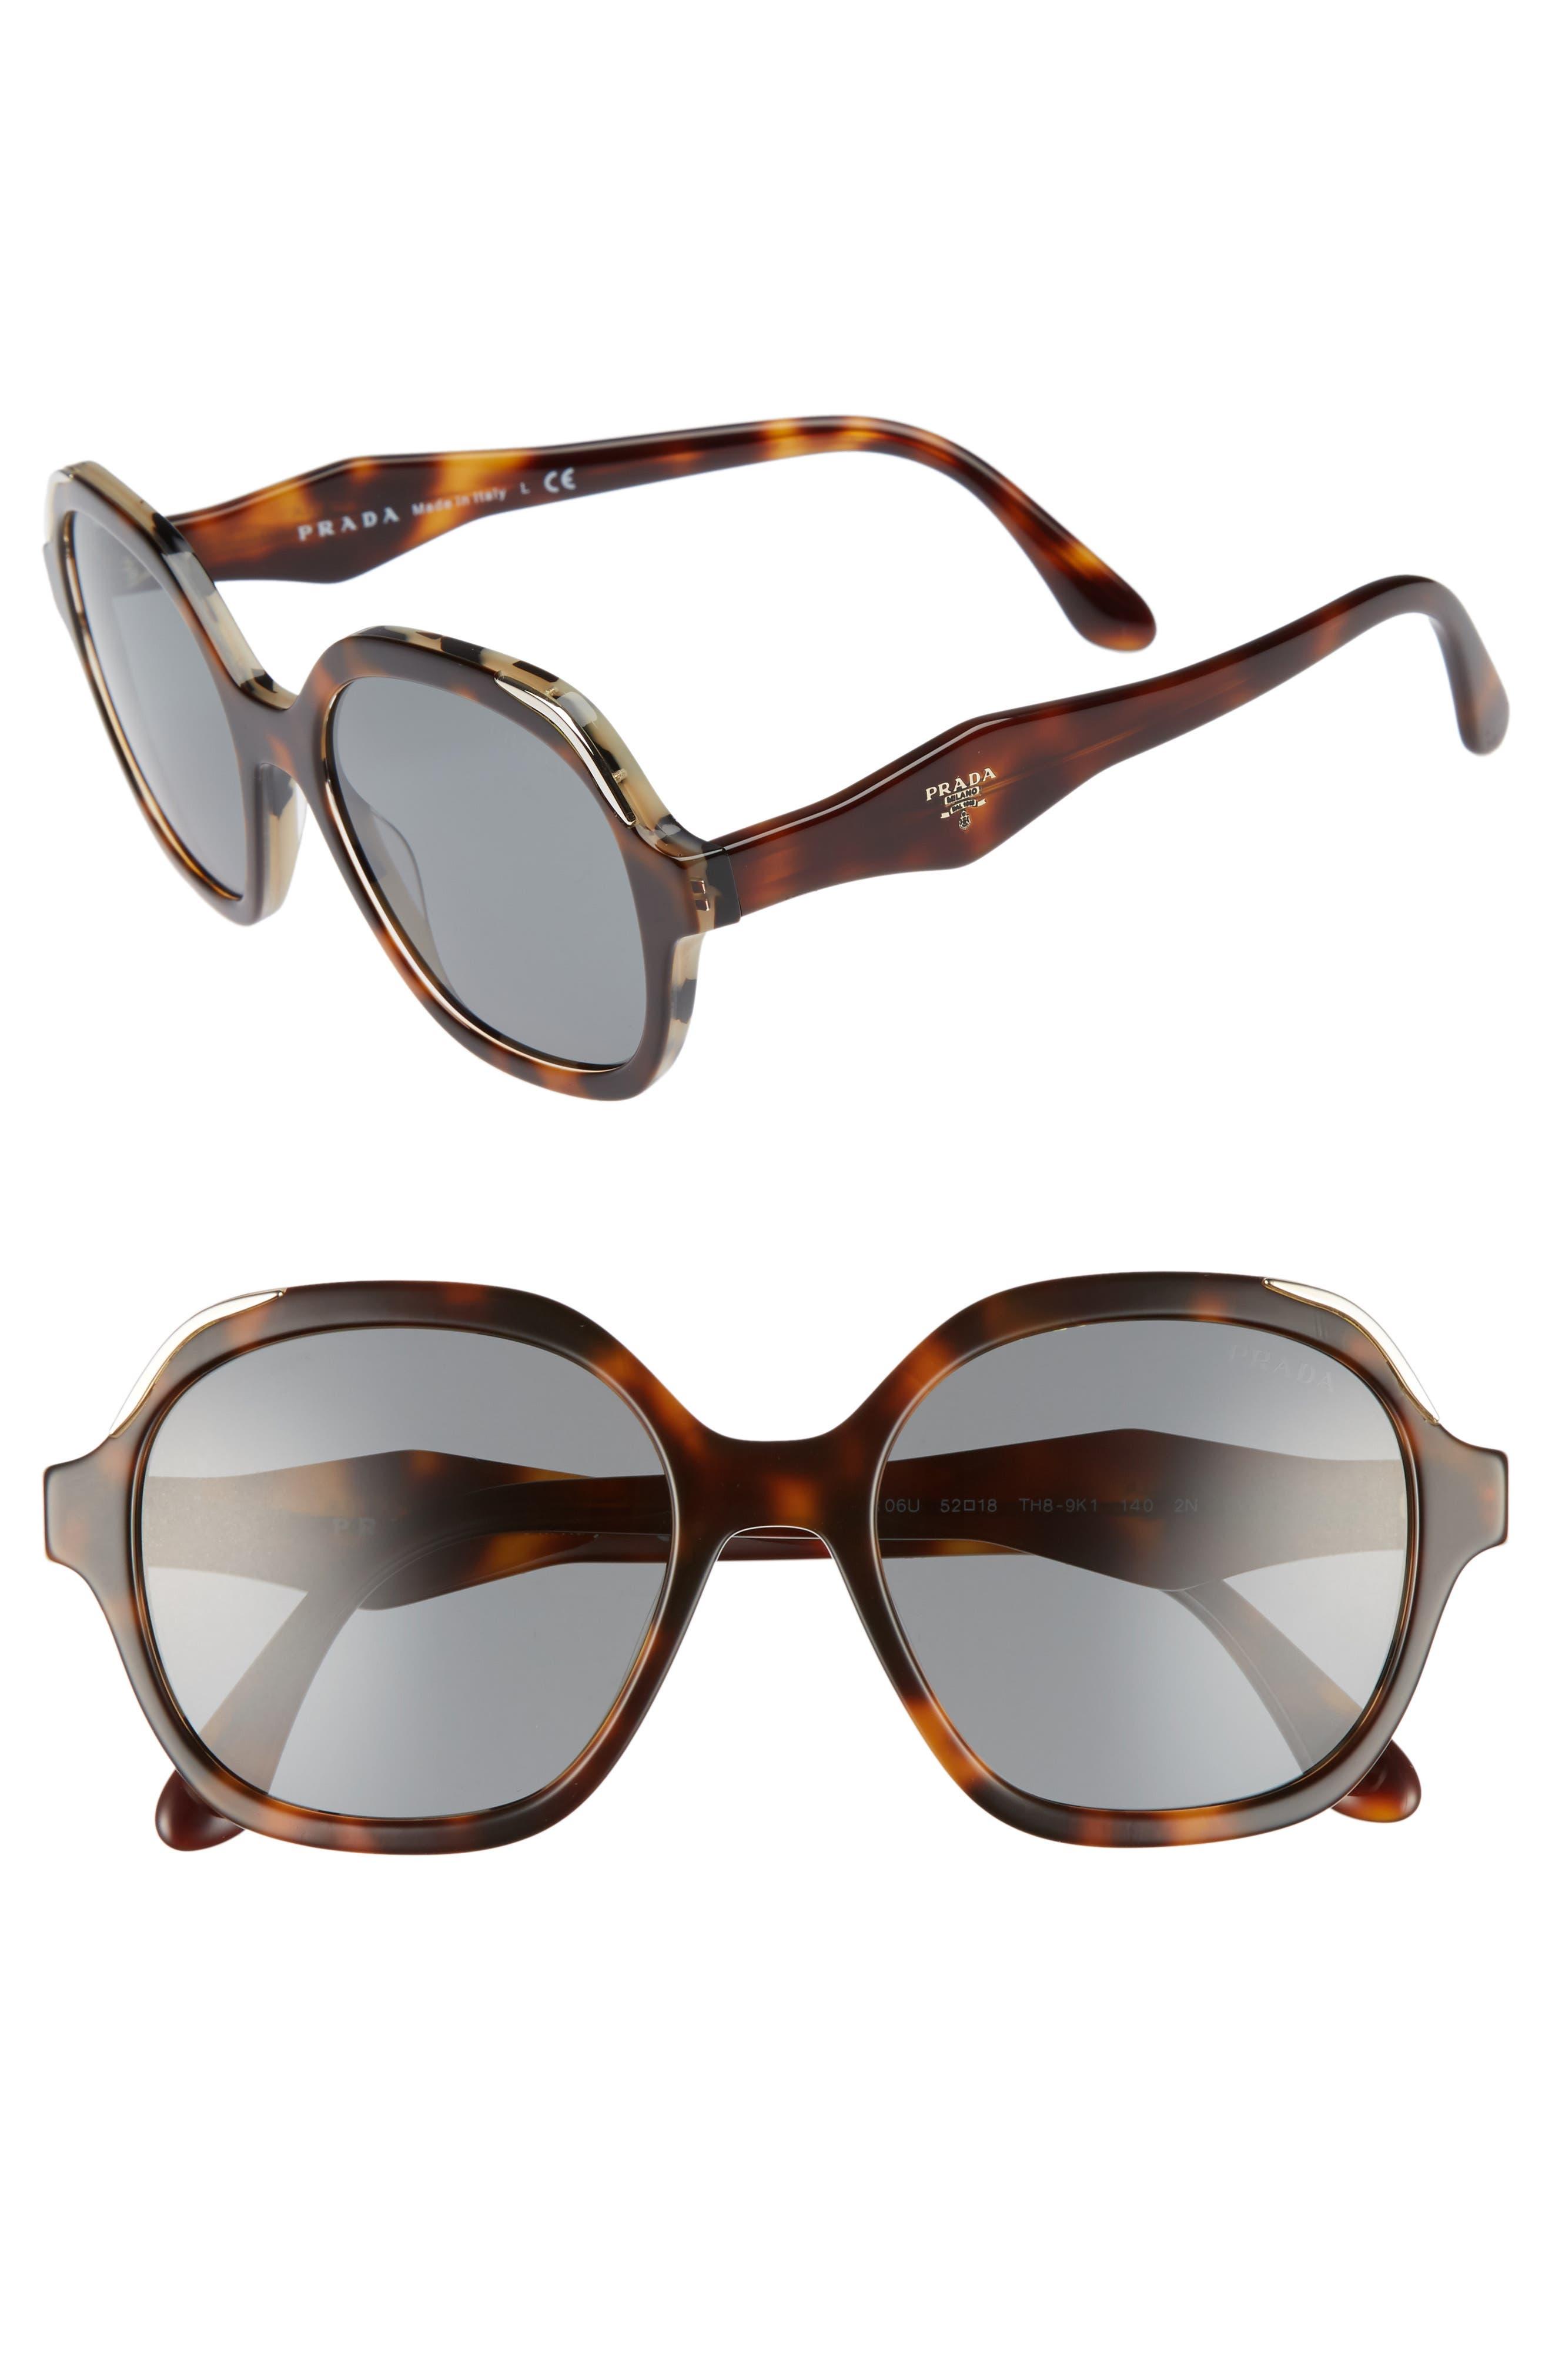 Main Image - Prada 50mm Square Sunglasses